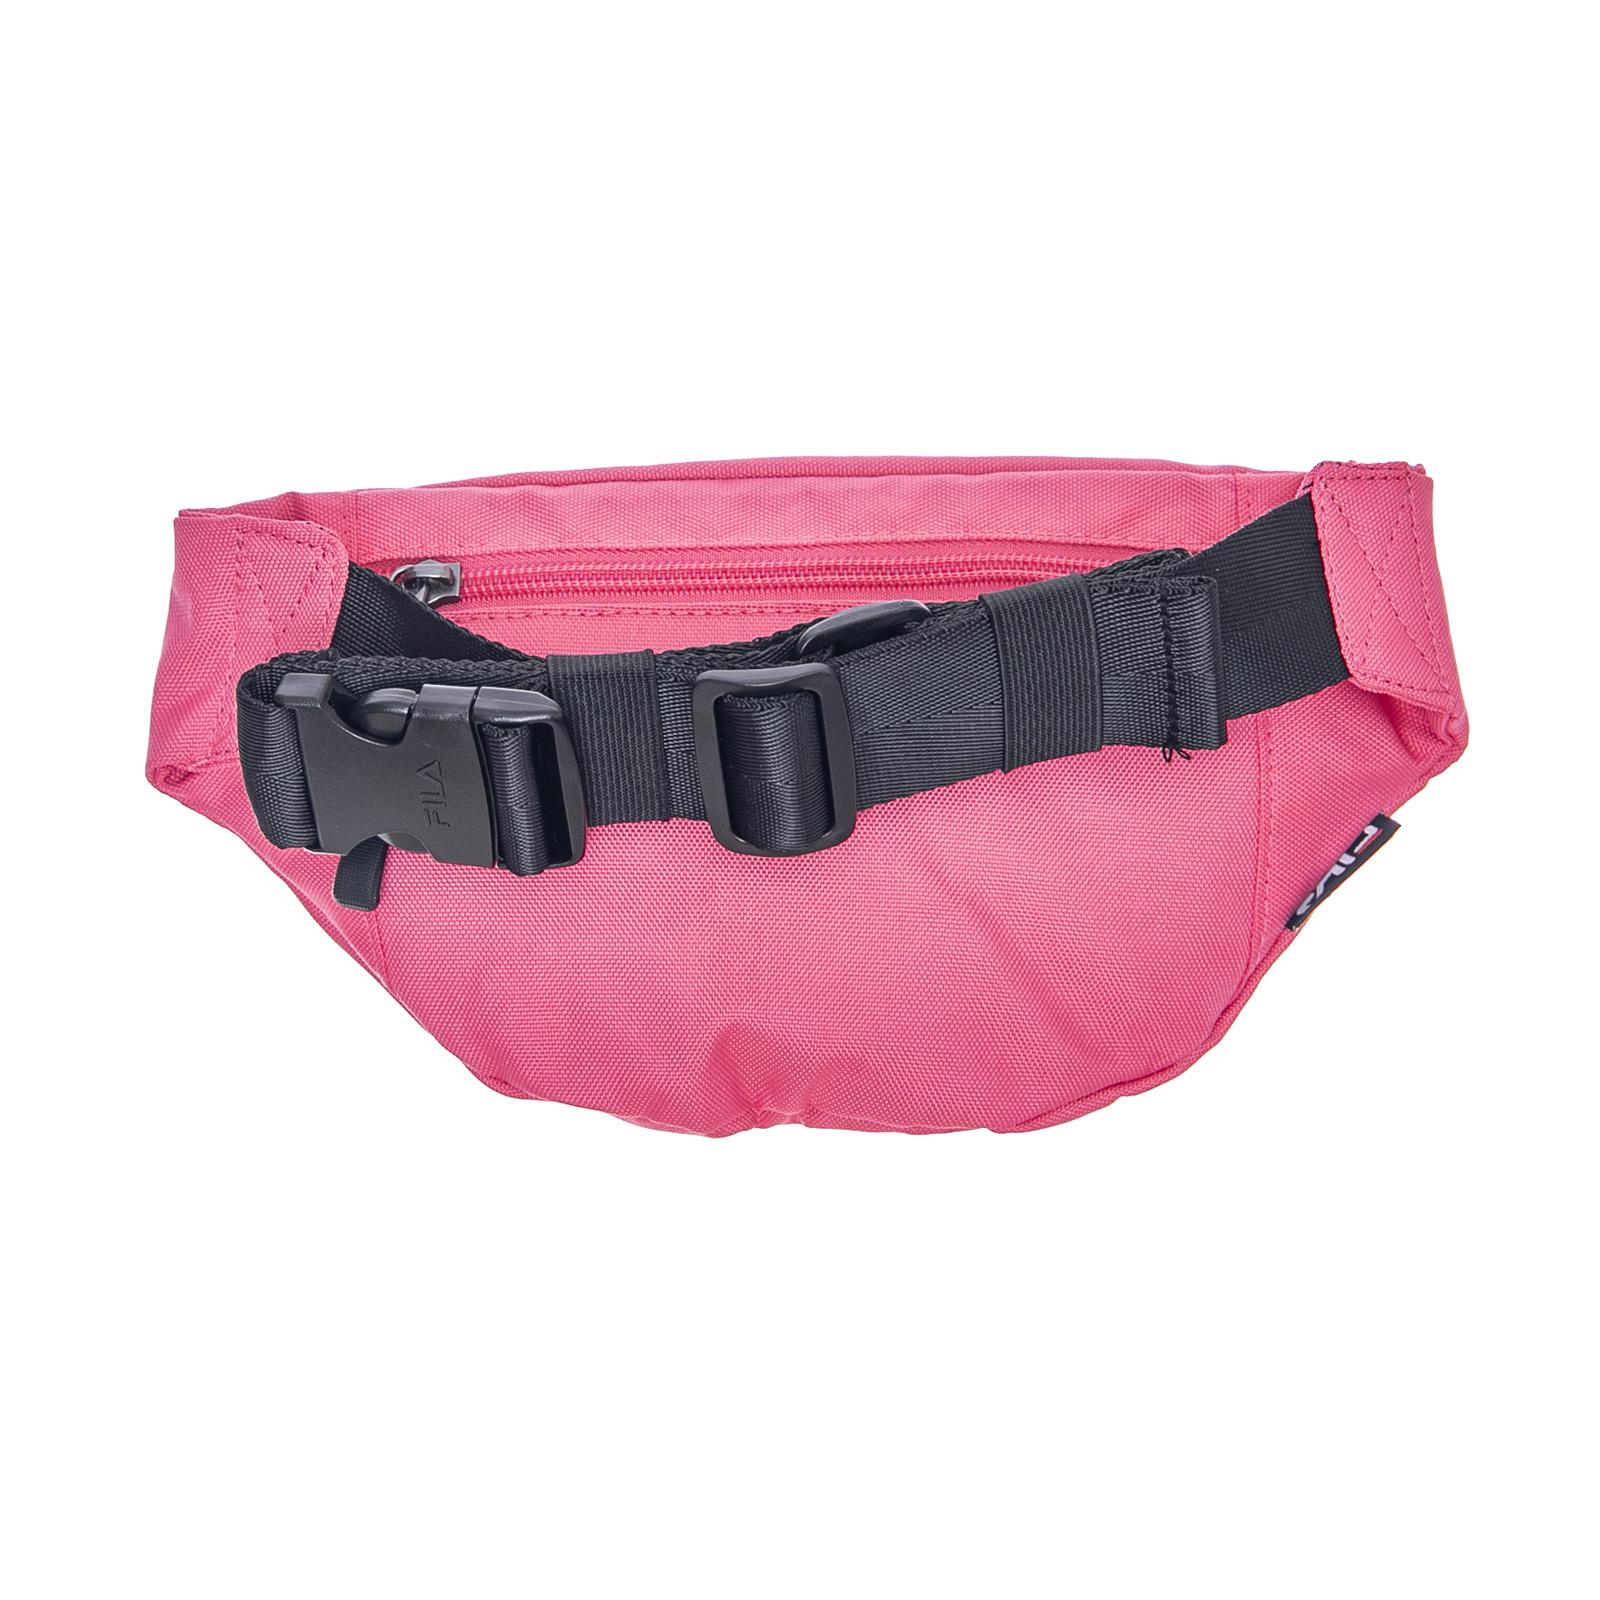 FILA LOGO WAIST Bag Slim - Pink - Marsupio Rosa